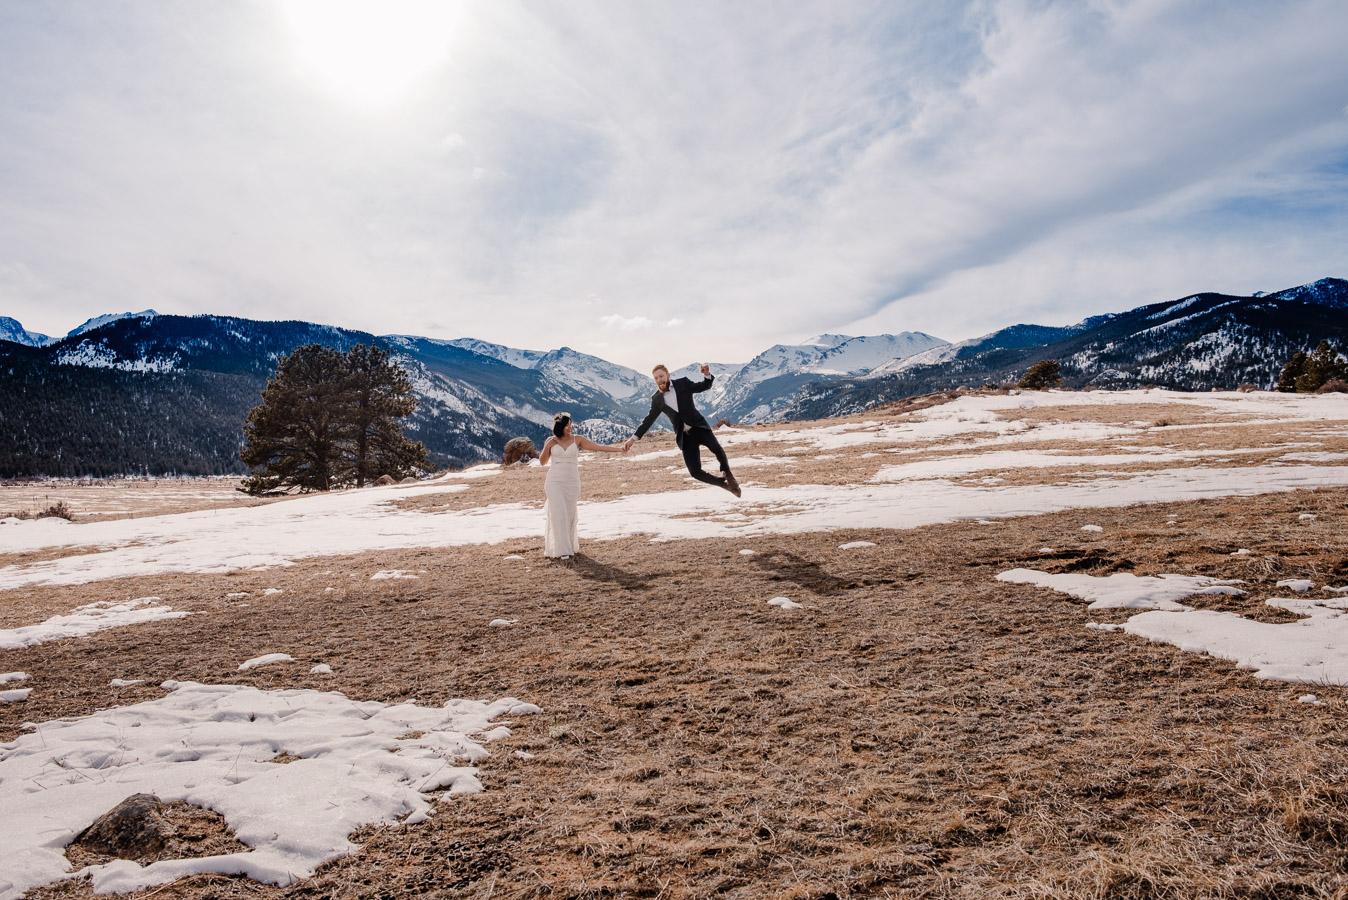 Rocky Mountain National Park Elopement Photographer {Kenia & Colt | National Park Elopement Photographer} | Colorado Mountain Elopement Photographers